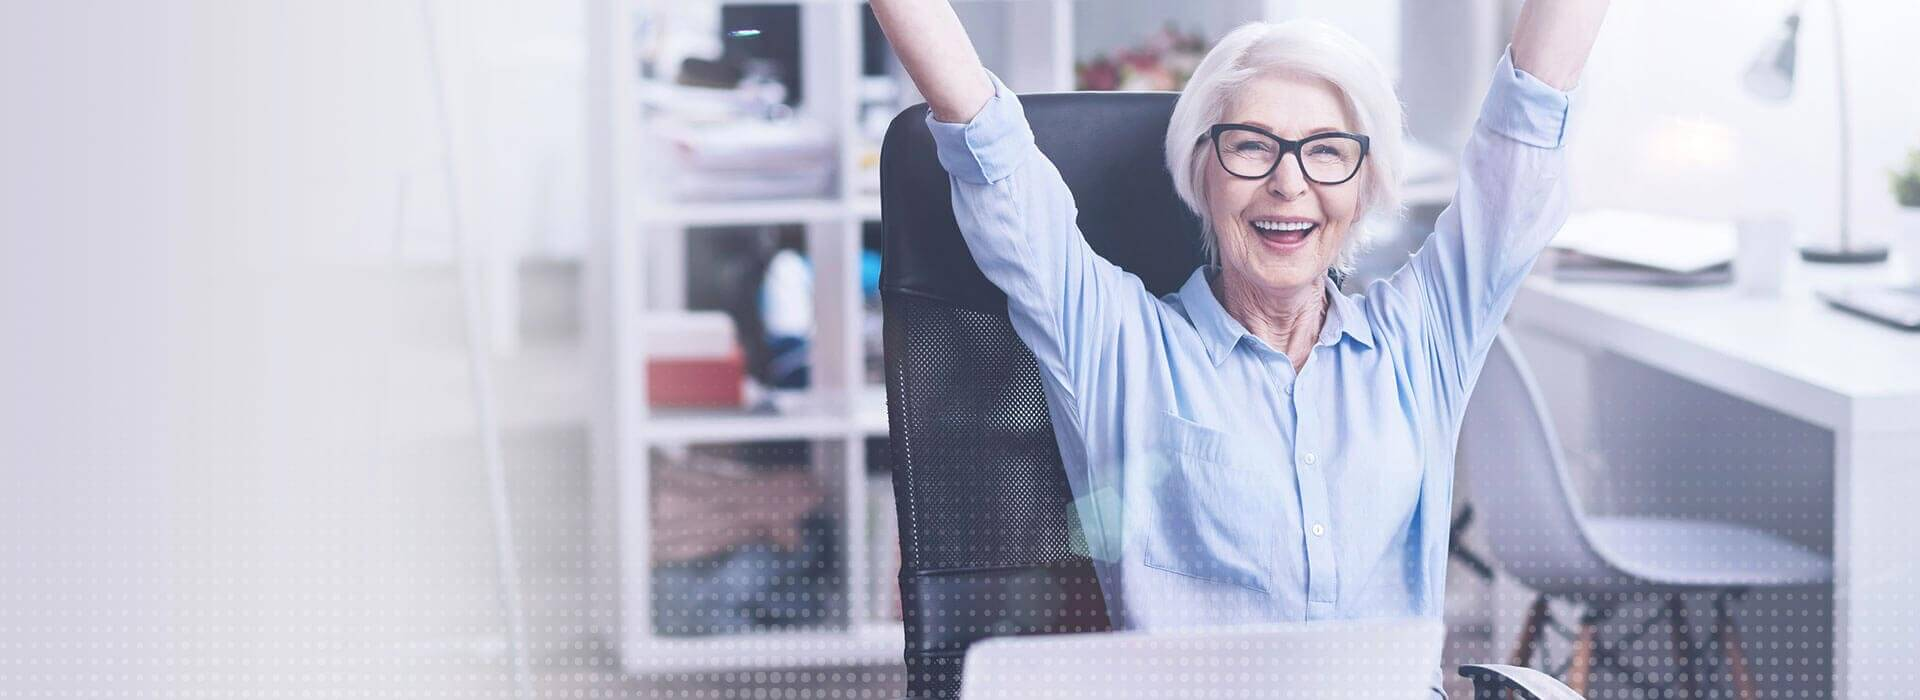 eine ältere Frau im Büro freut sich